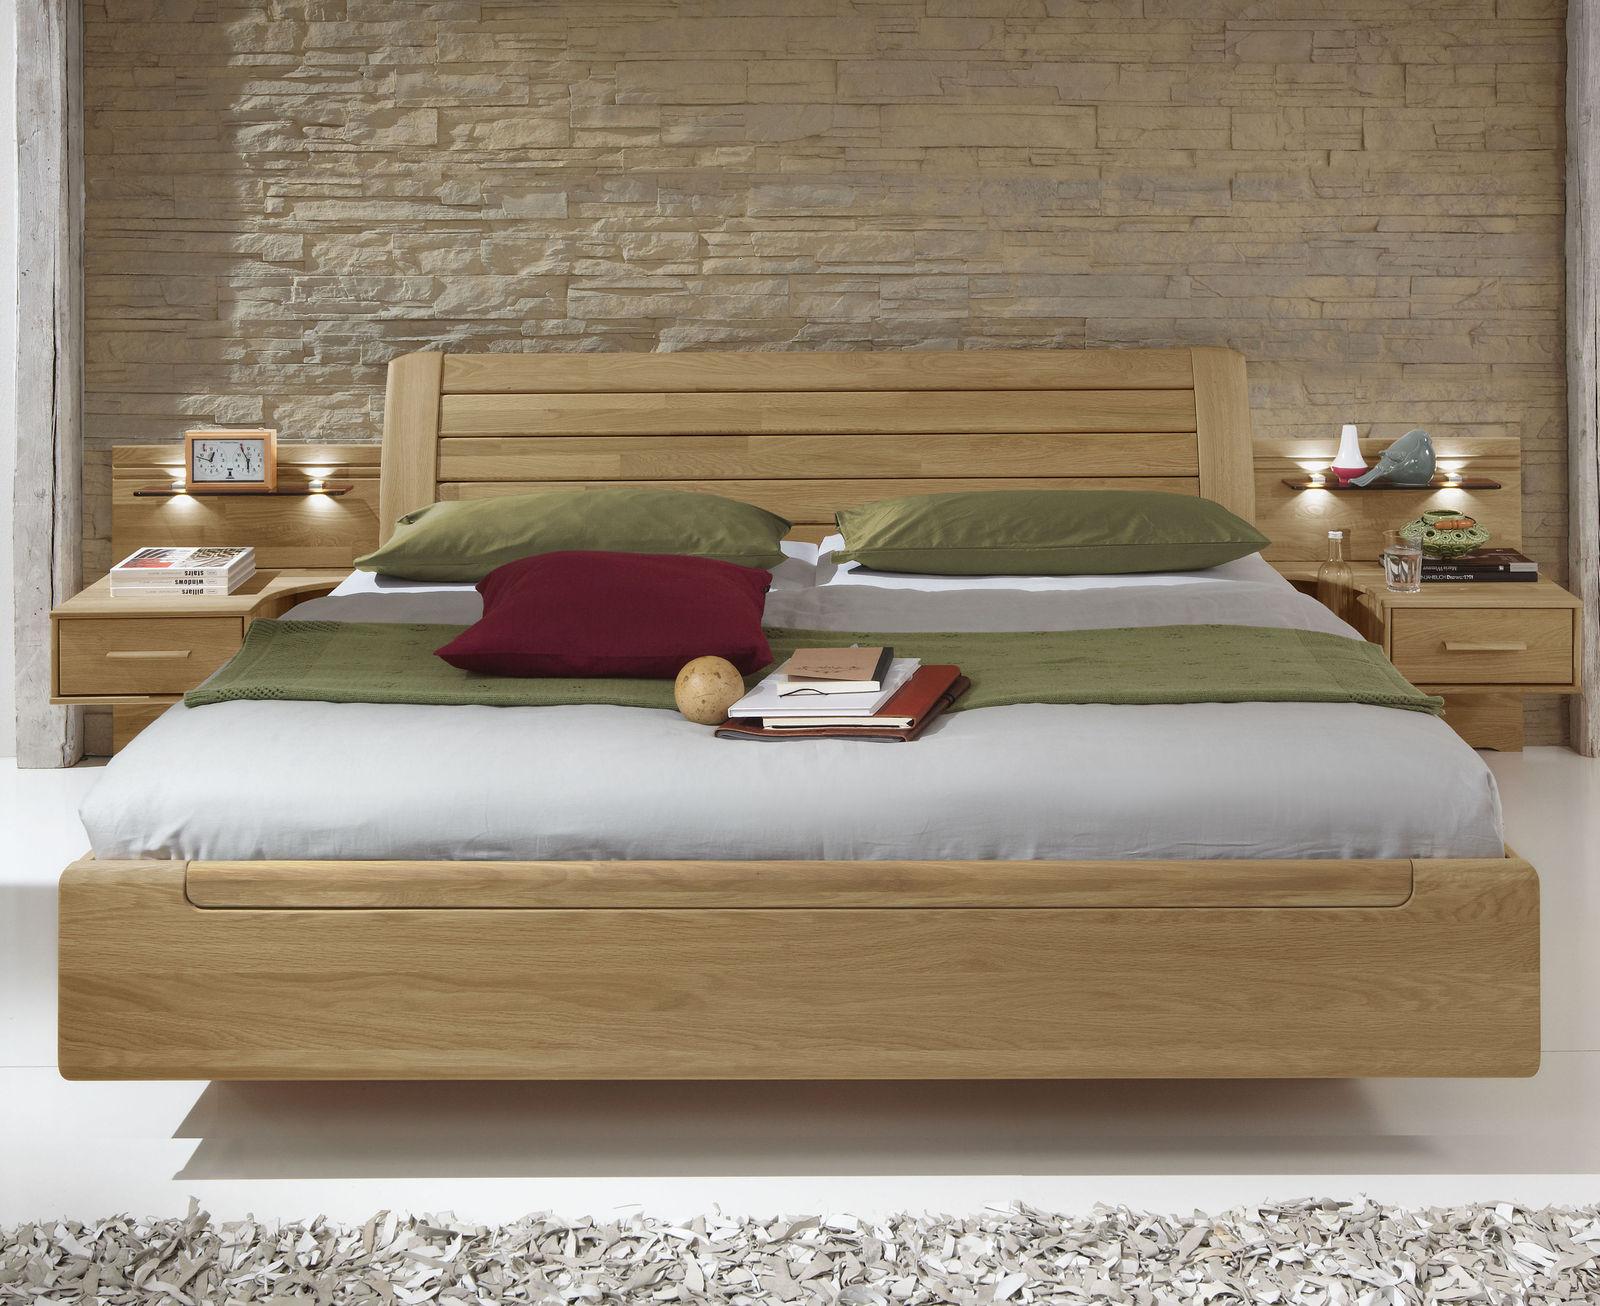 beautiful hochwertiges bett fur schlafzimmer qualitatsgarantie ... - Hochwertiges Bett Fur Schlafzimmer Qualitatsgarantie